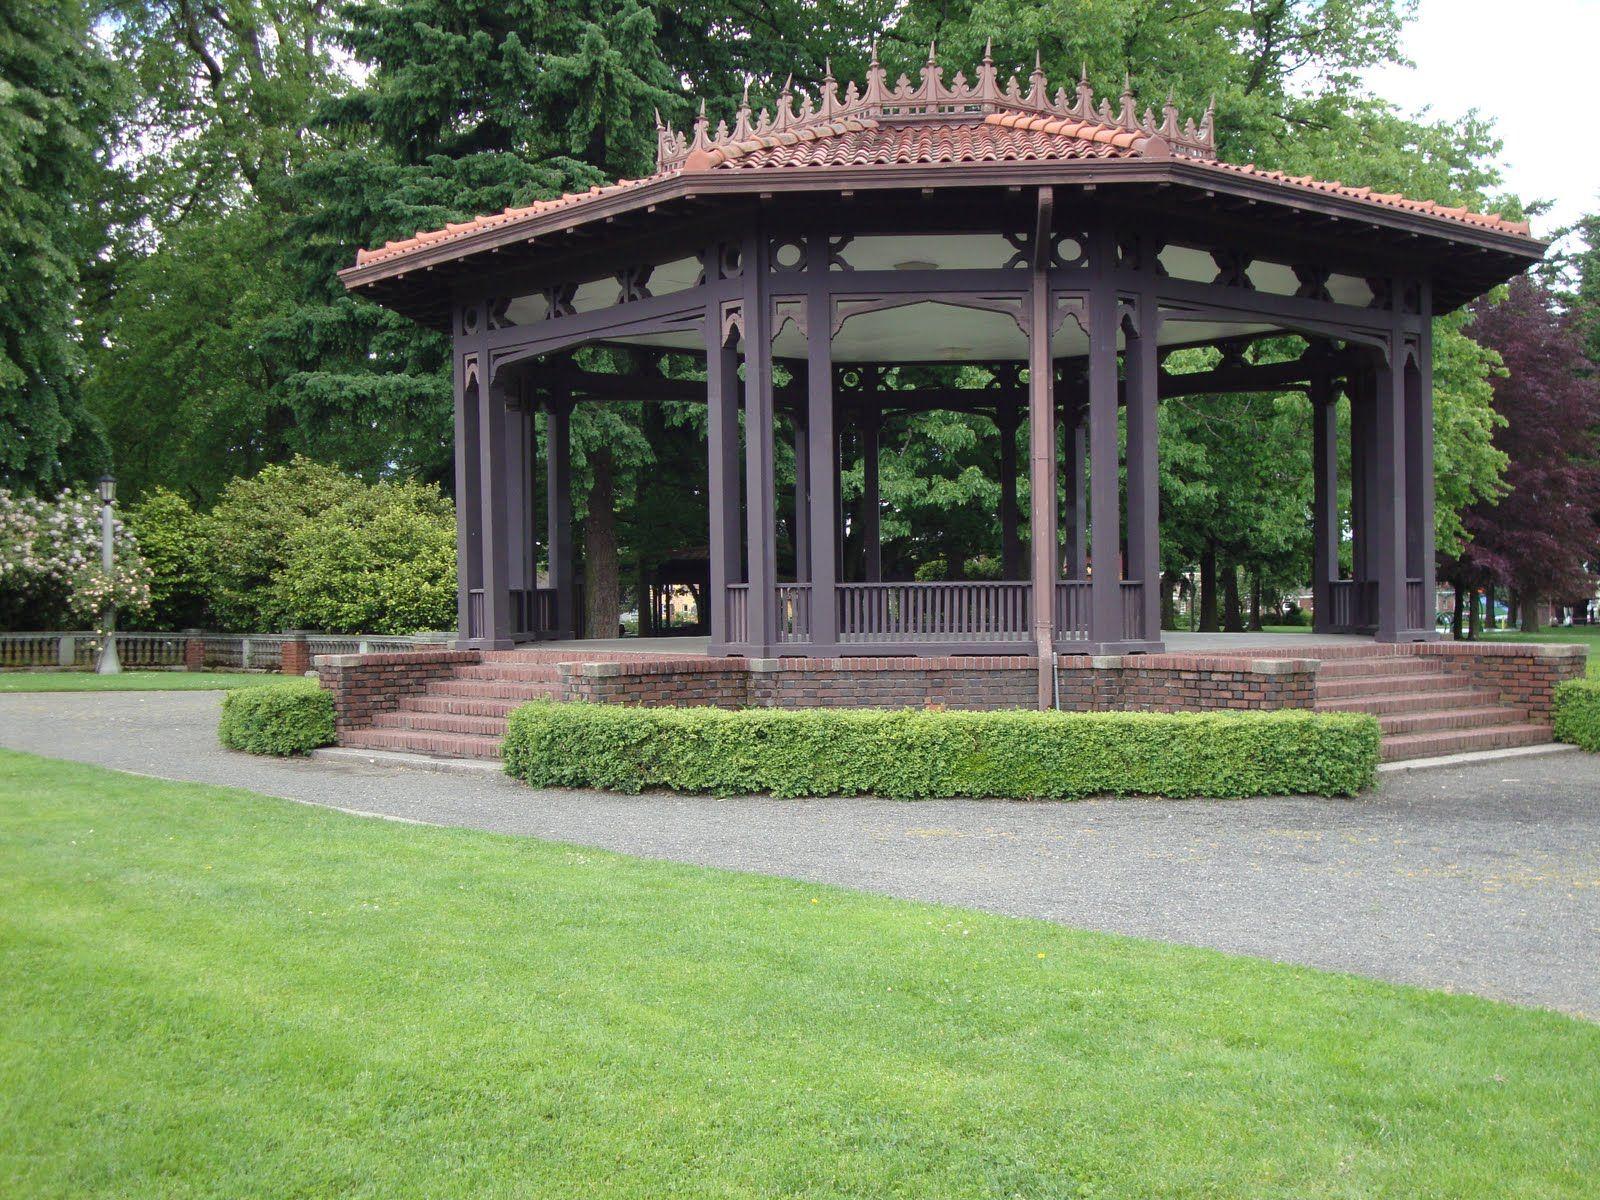 Peninsula Park Portland Gazebo Outdoor Structures Gazebo Beautiful Places